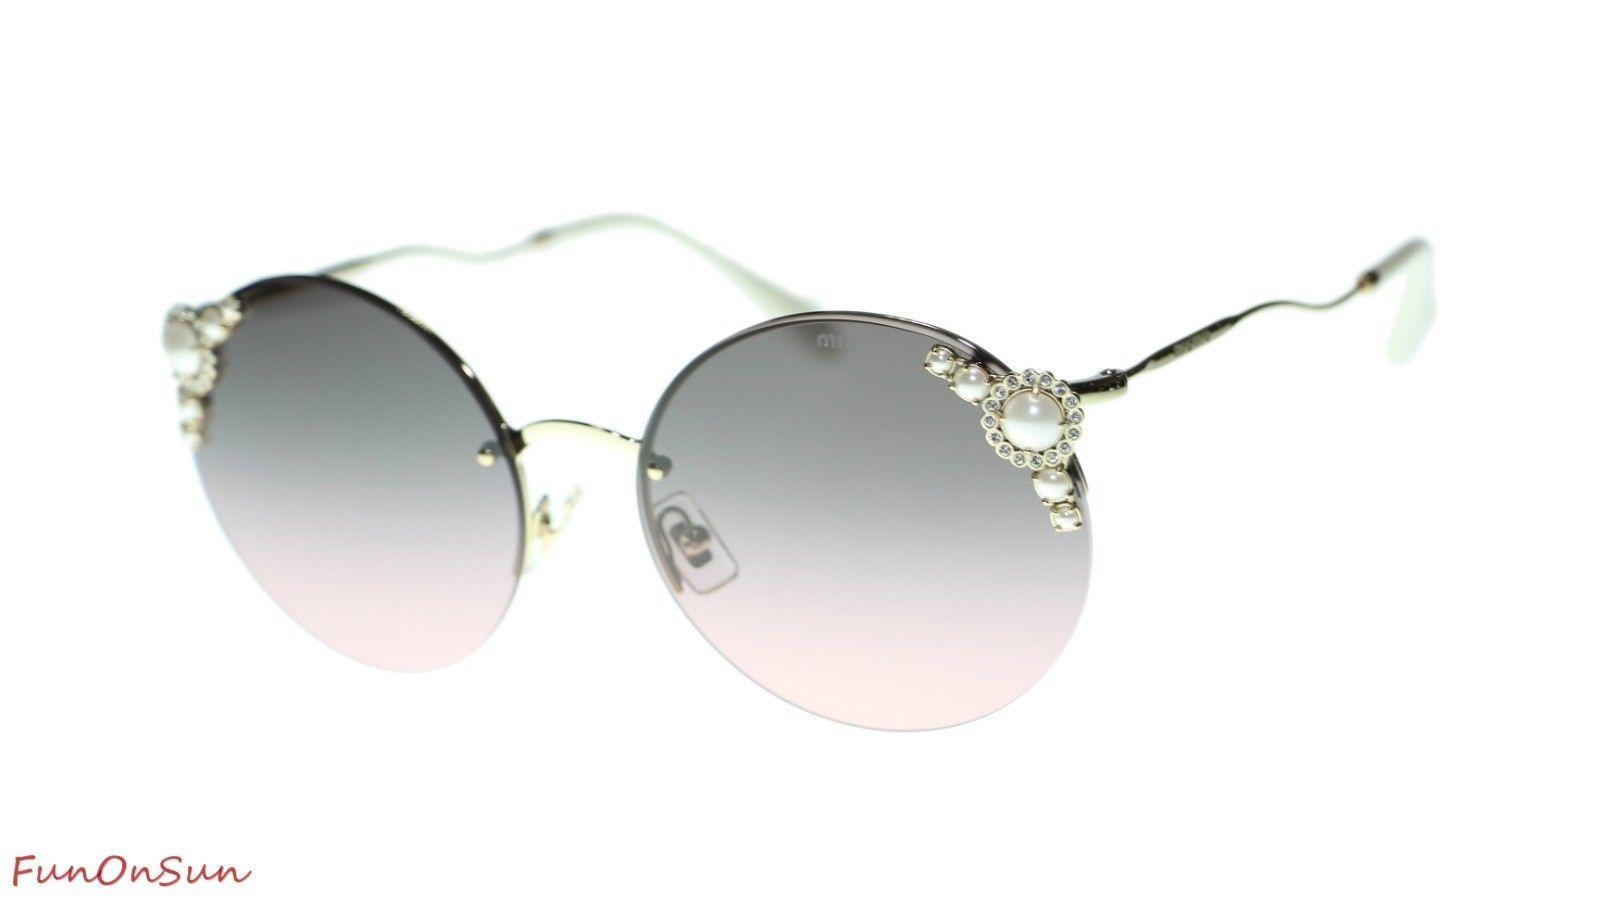 MIU MIU WOMEN SUNGLASSES MU52TS VW7146 Pale Gold/Pink Gradient Grey 60mm